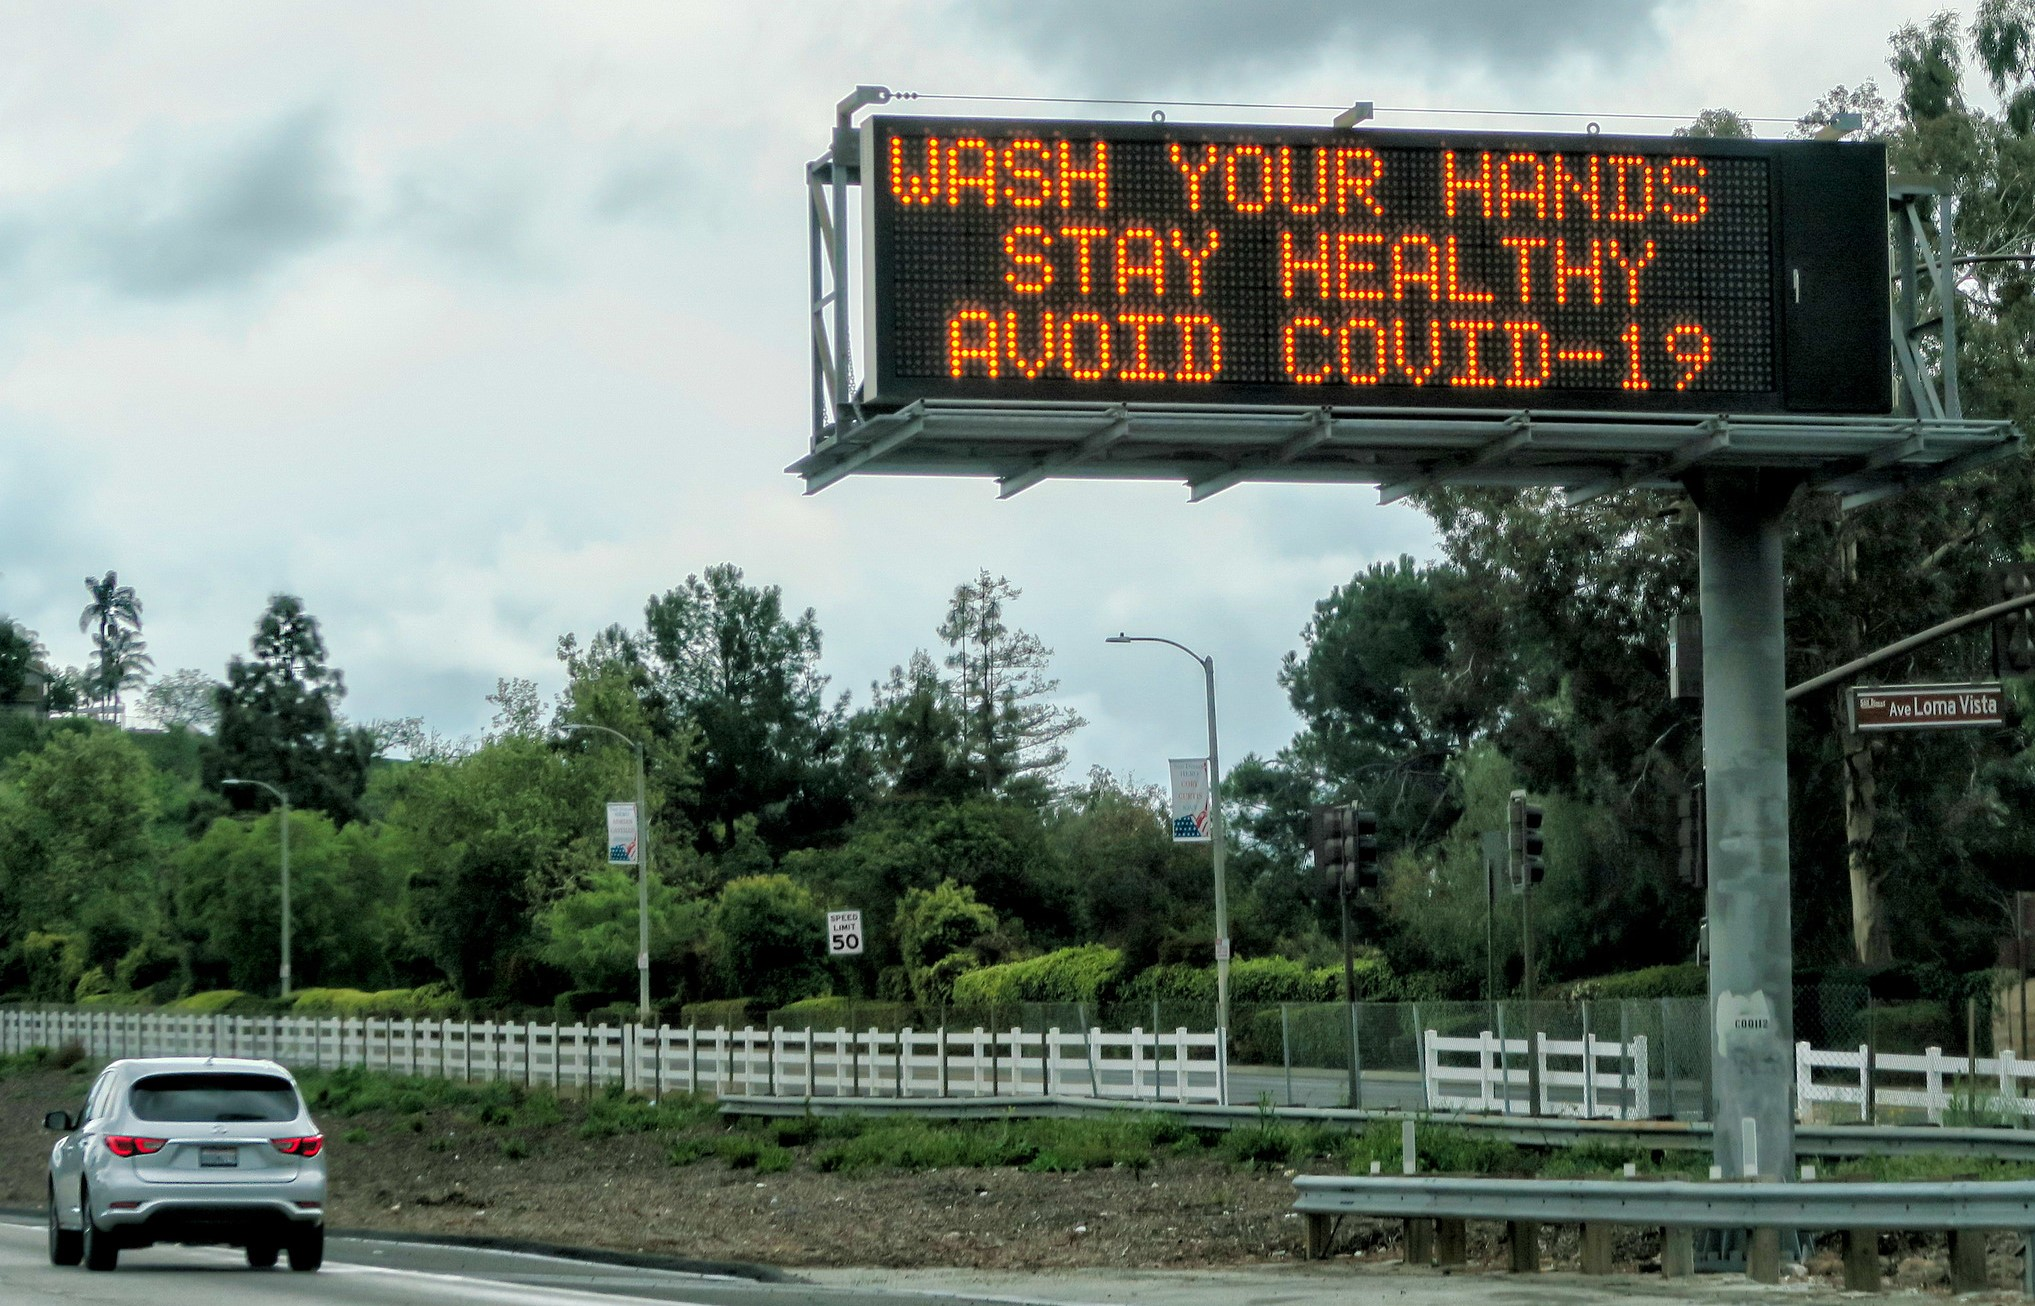 Freeway coronavirus warning on California.  Image credit: Russ Allison Loar